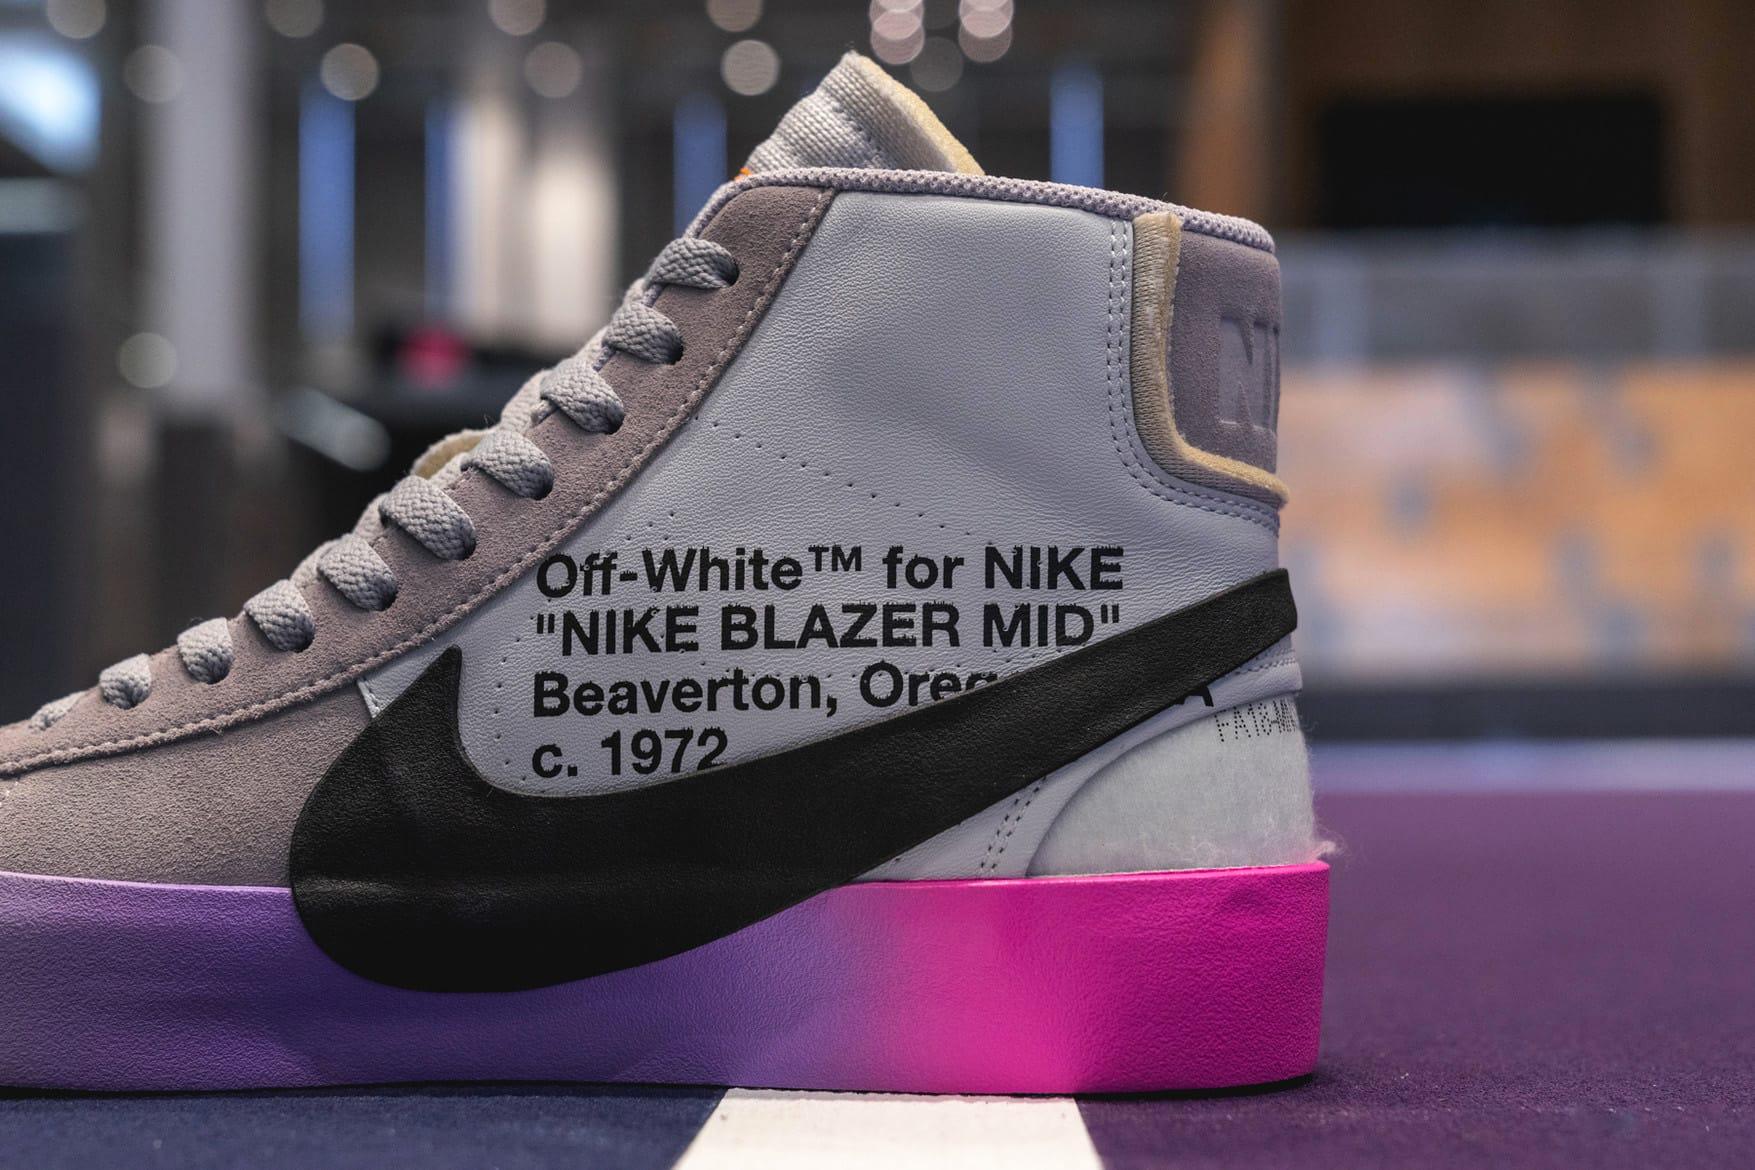 Serena Williams' Off-White x Nike